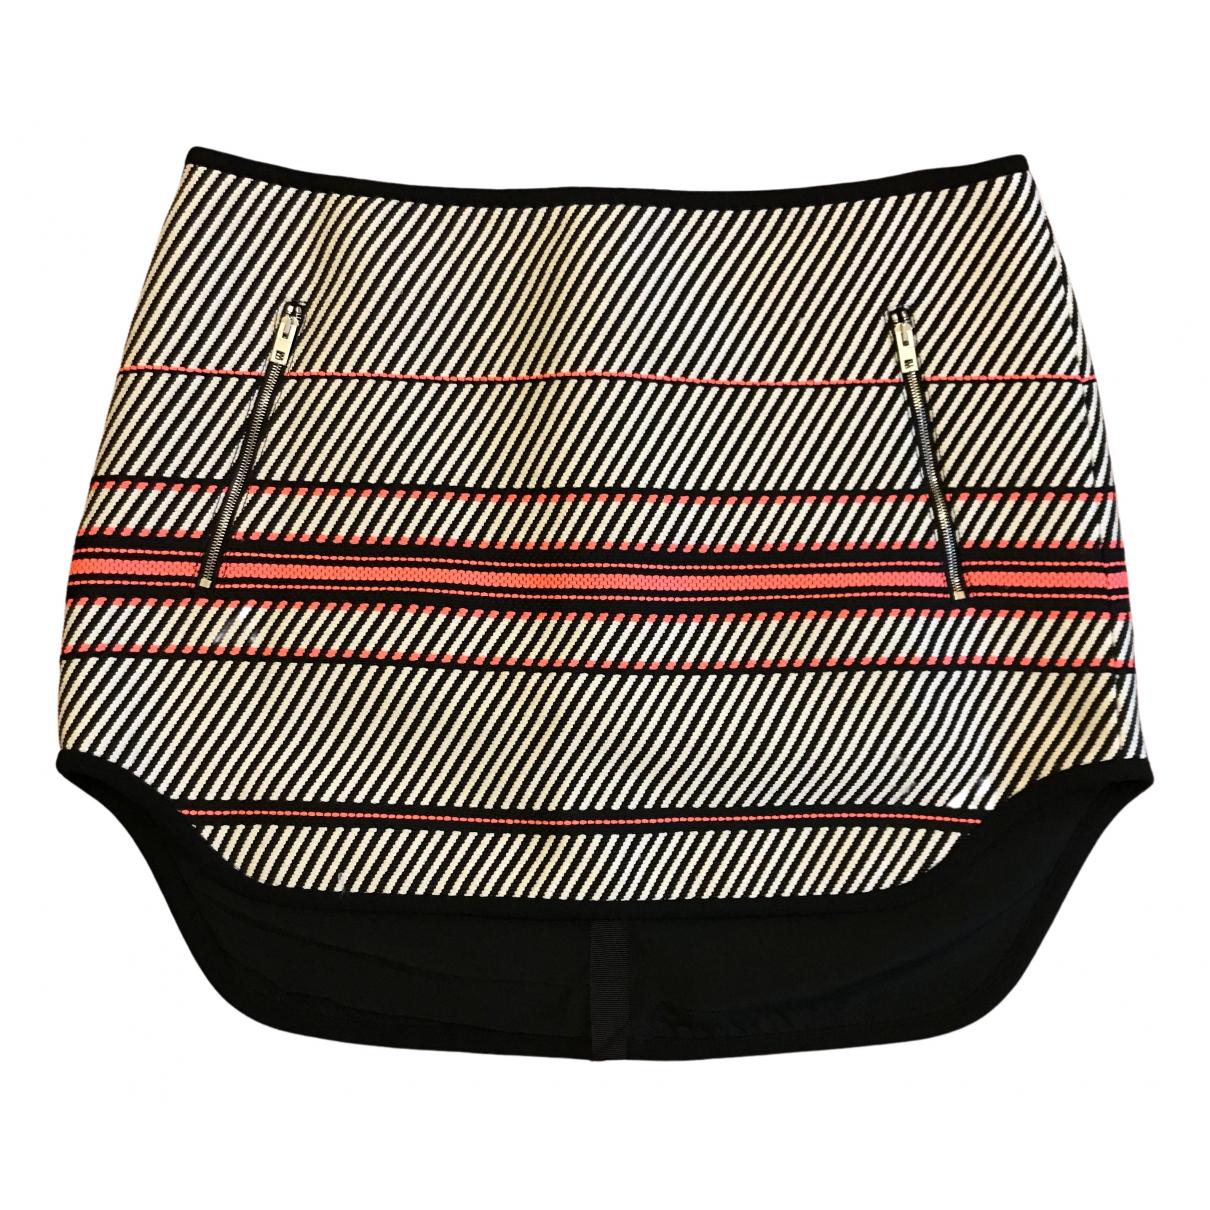 Rag & Bone - Jupe   pour femme - multicolore